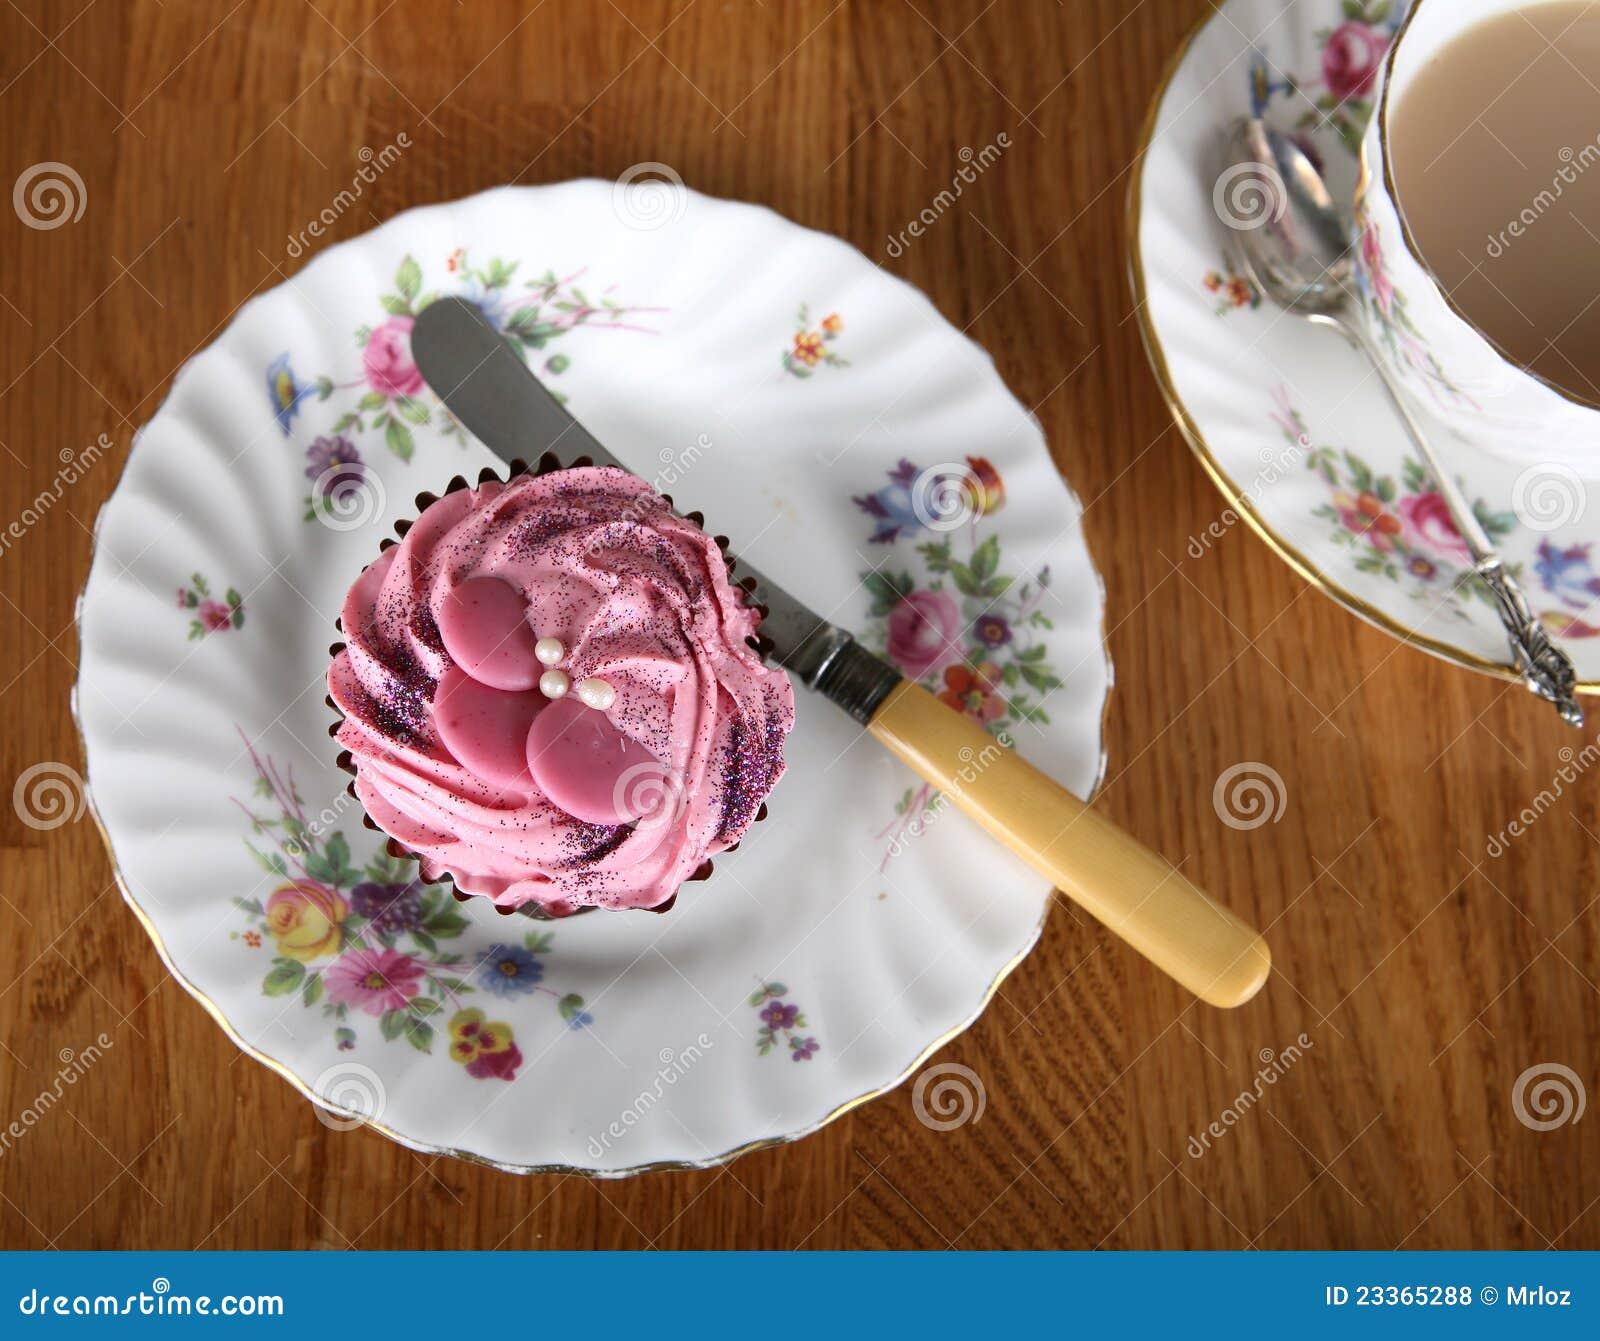 Single Cupcake with Tea